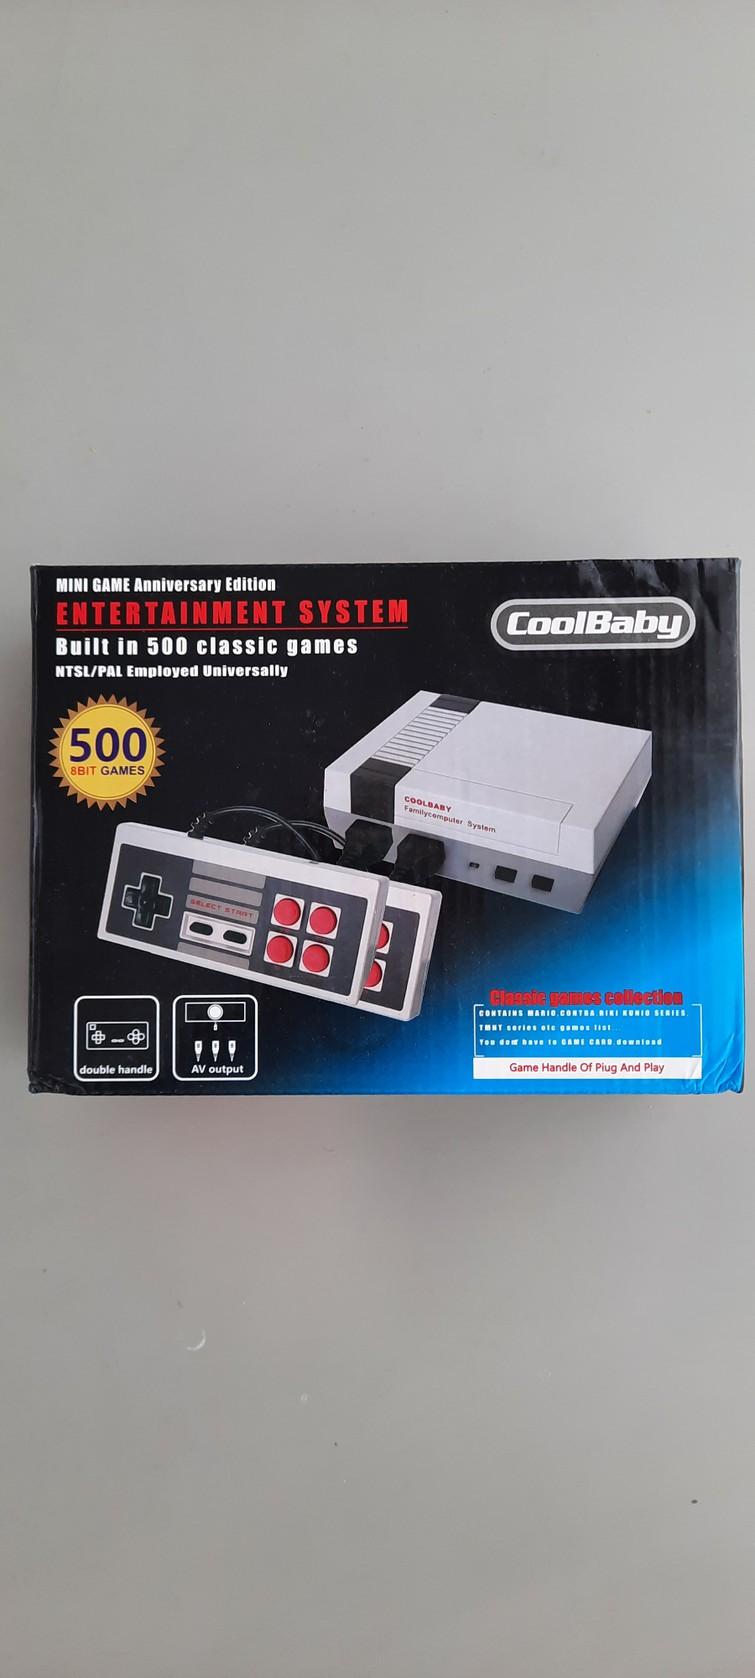 NES (Nintendo Entertainment System) game console